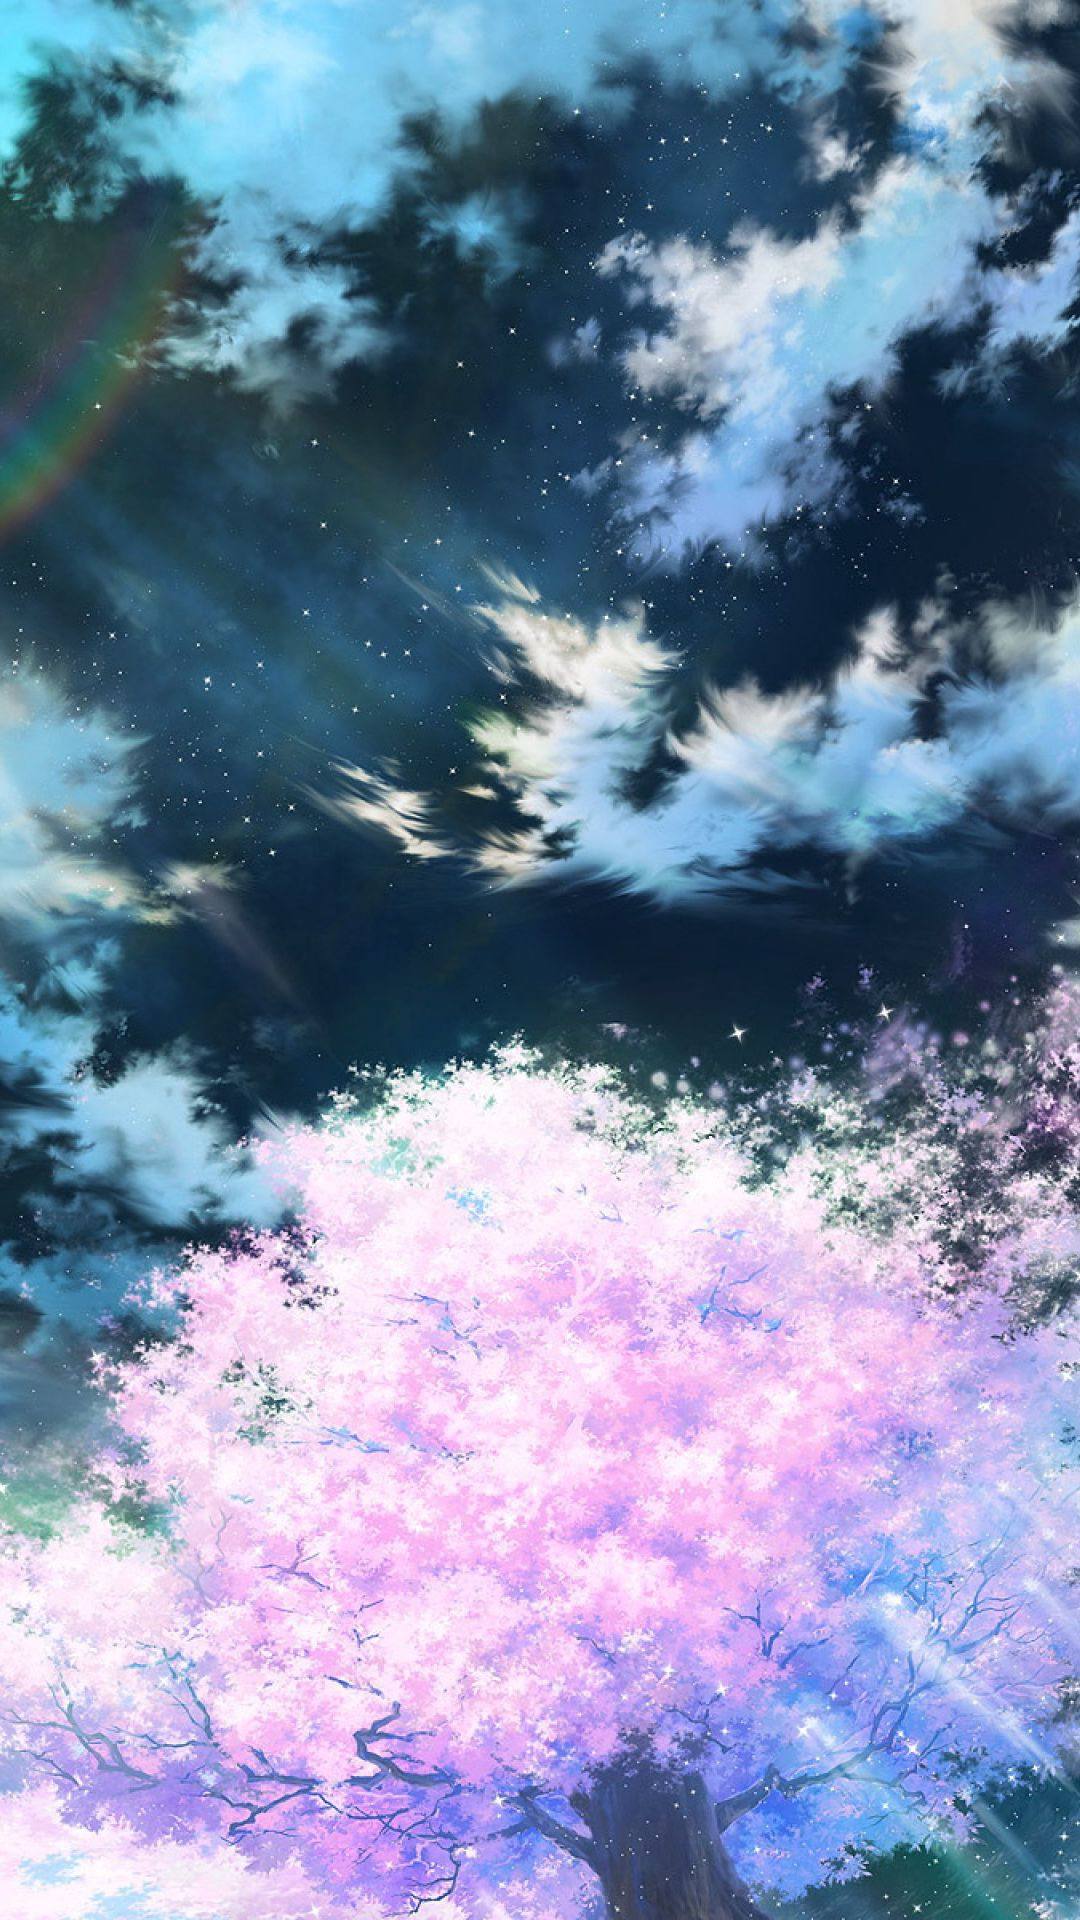 1080x1920 Обои сакура, арт, небо, аниме, розовый